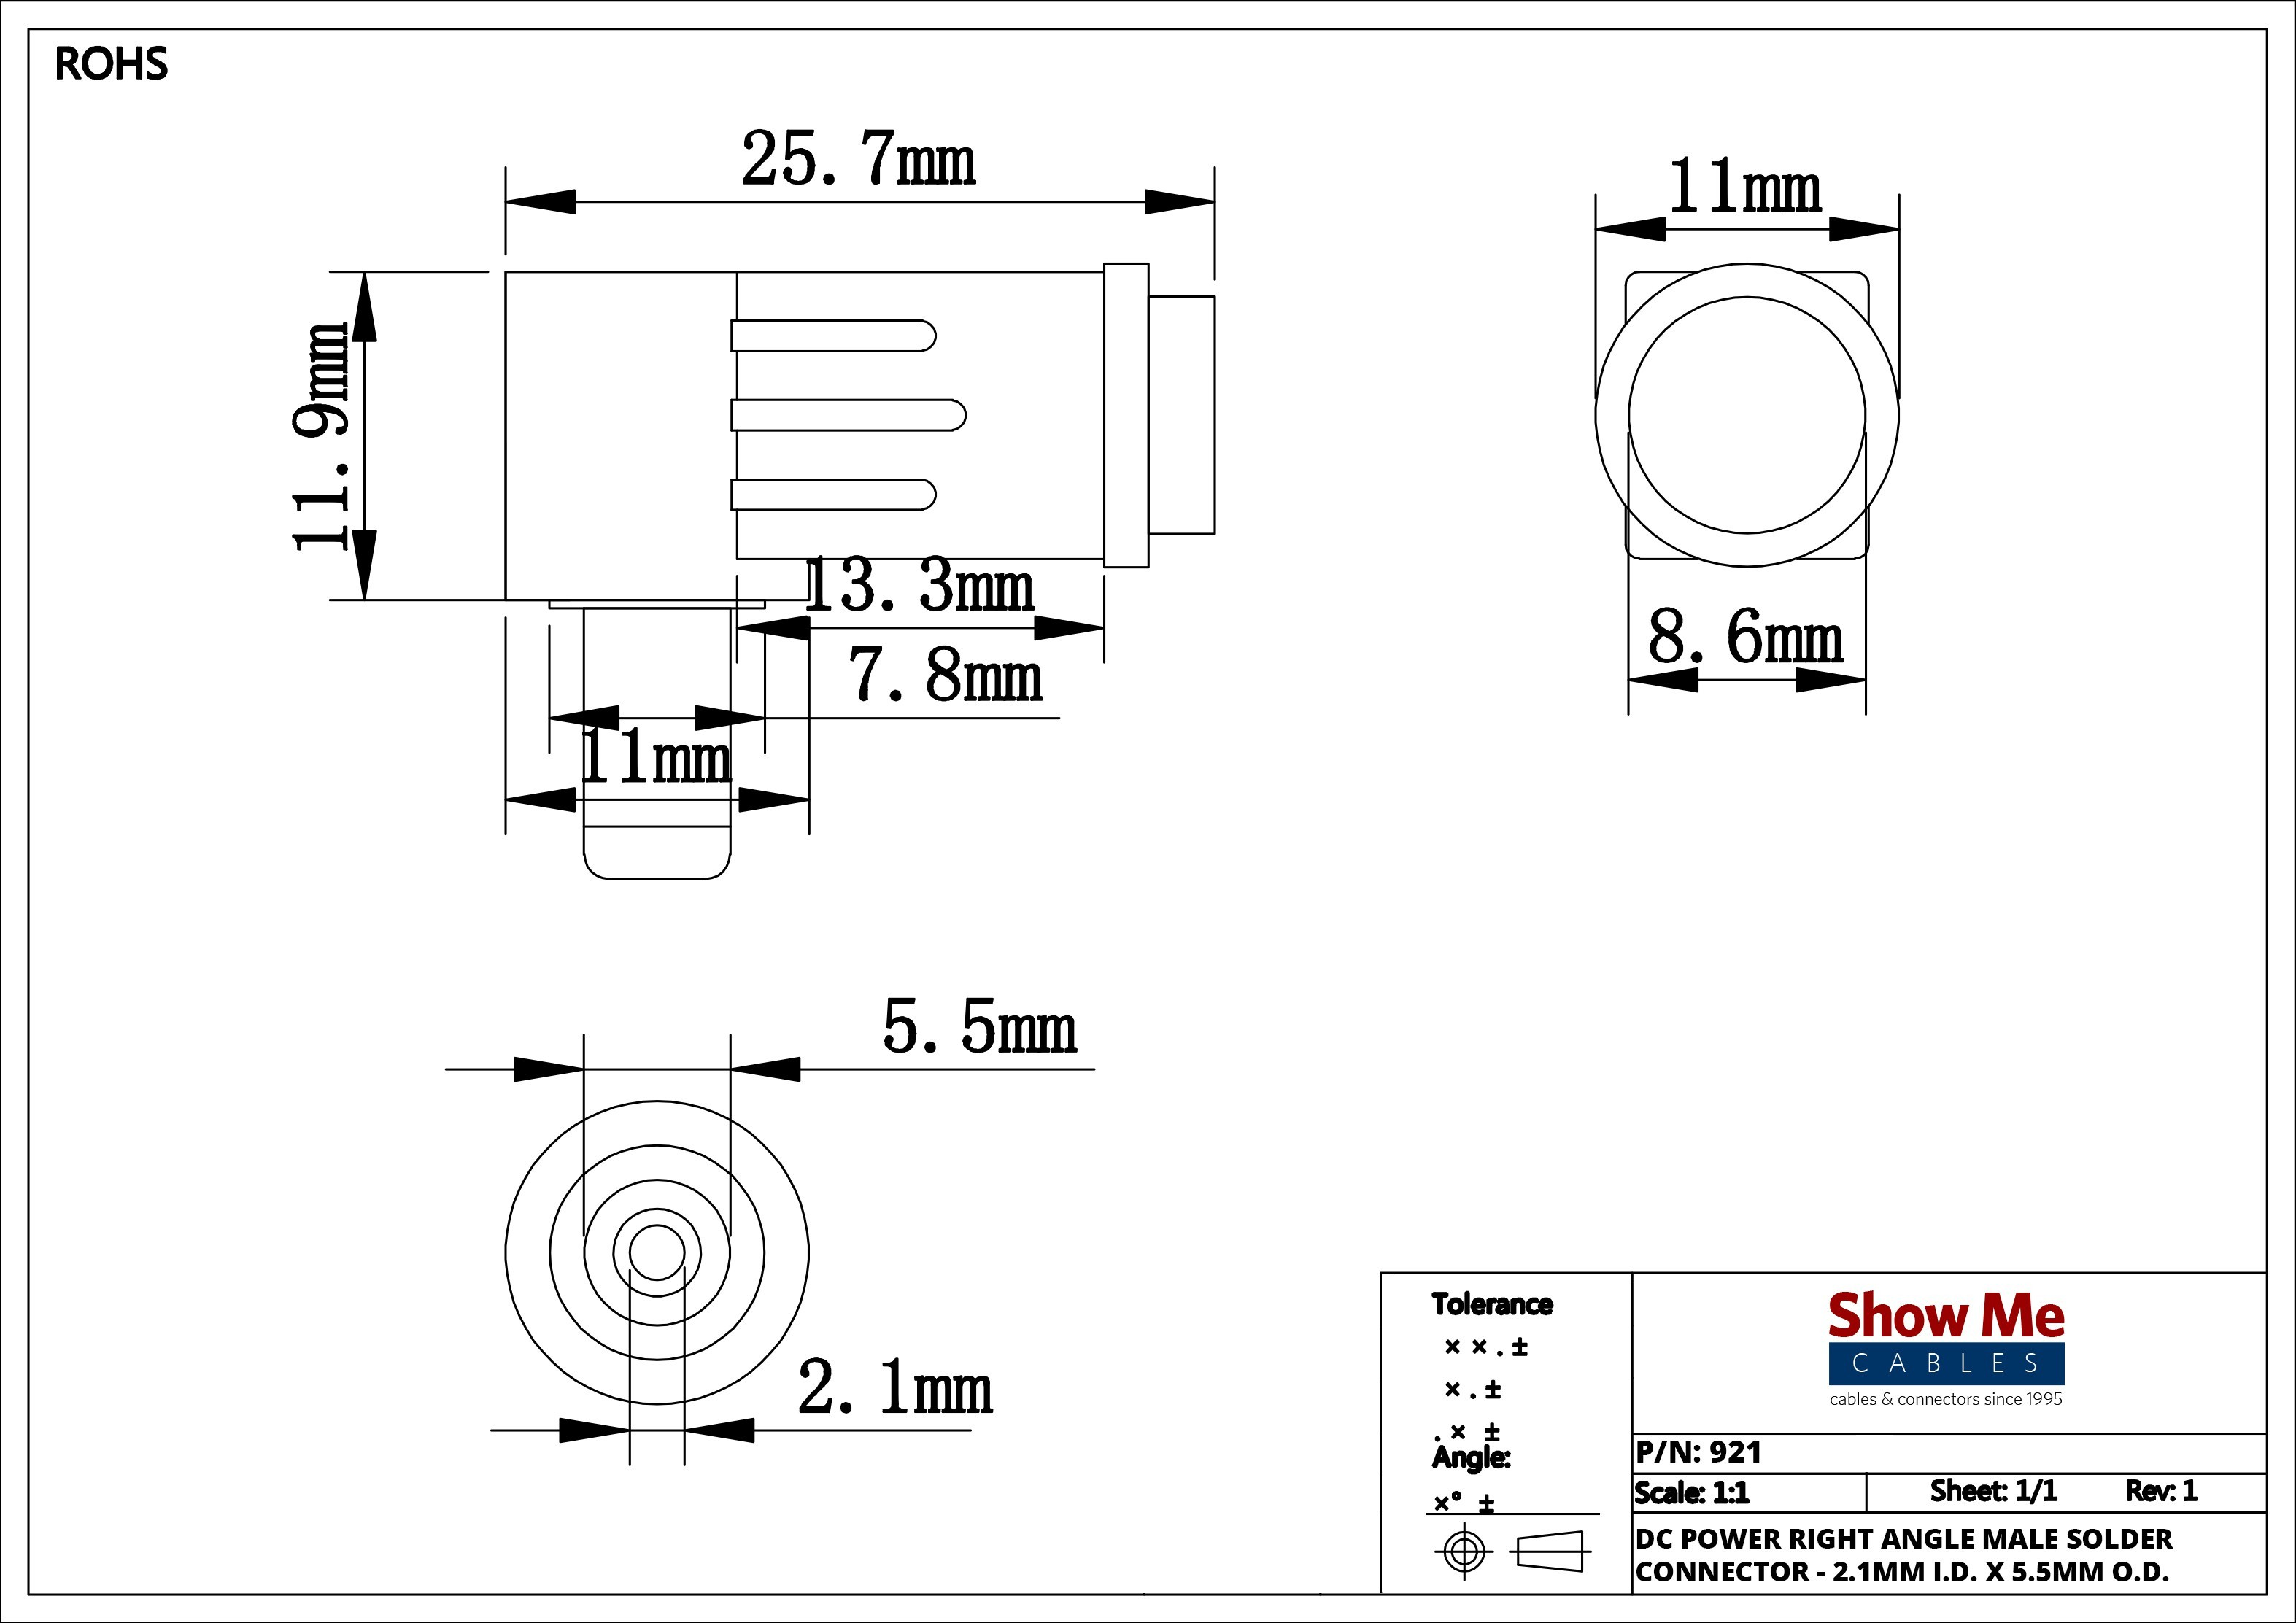 home speaker wiring diagram Collection 3 5 Mm Stereo Jack Wiring Diagram Elegant 2 5mm DOWNLOAD Wiring Diagram